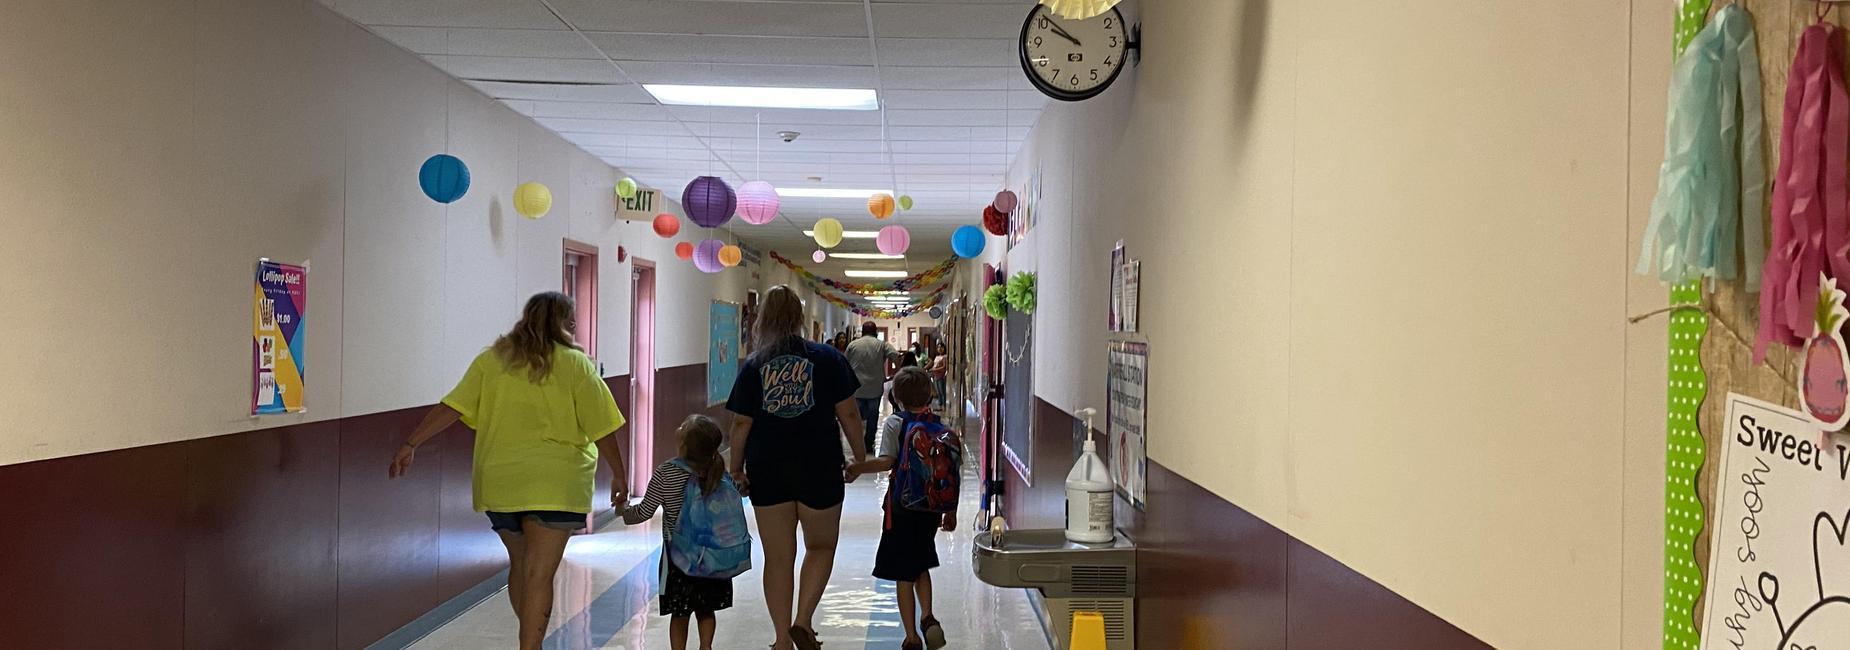 Open House 2021-2022 Families in Hallway